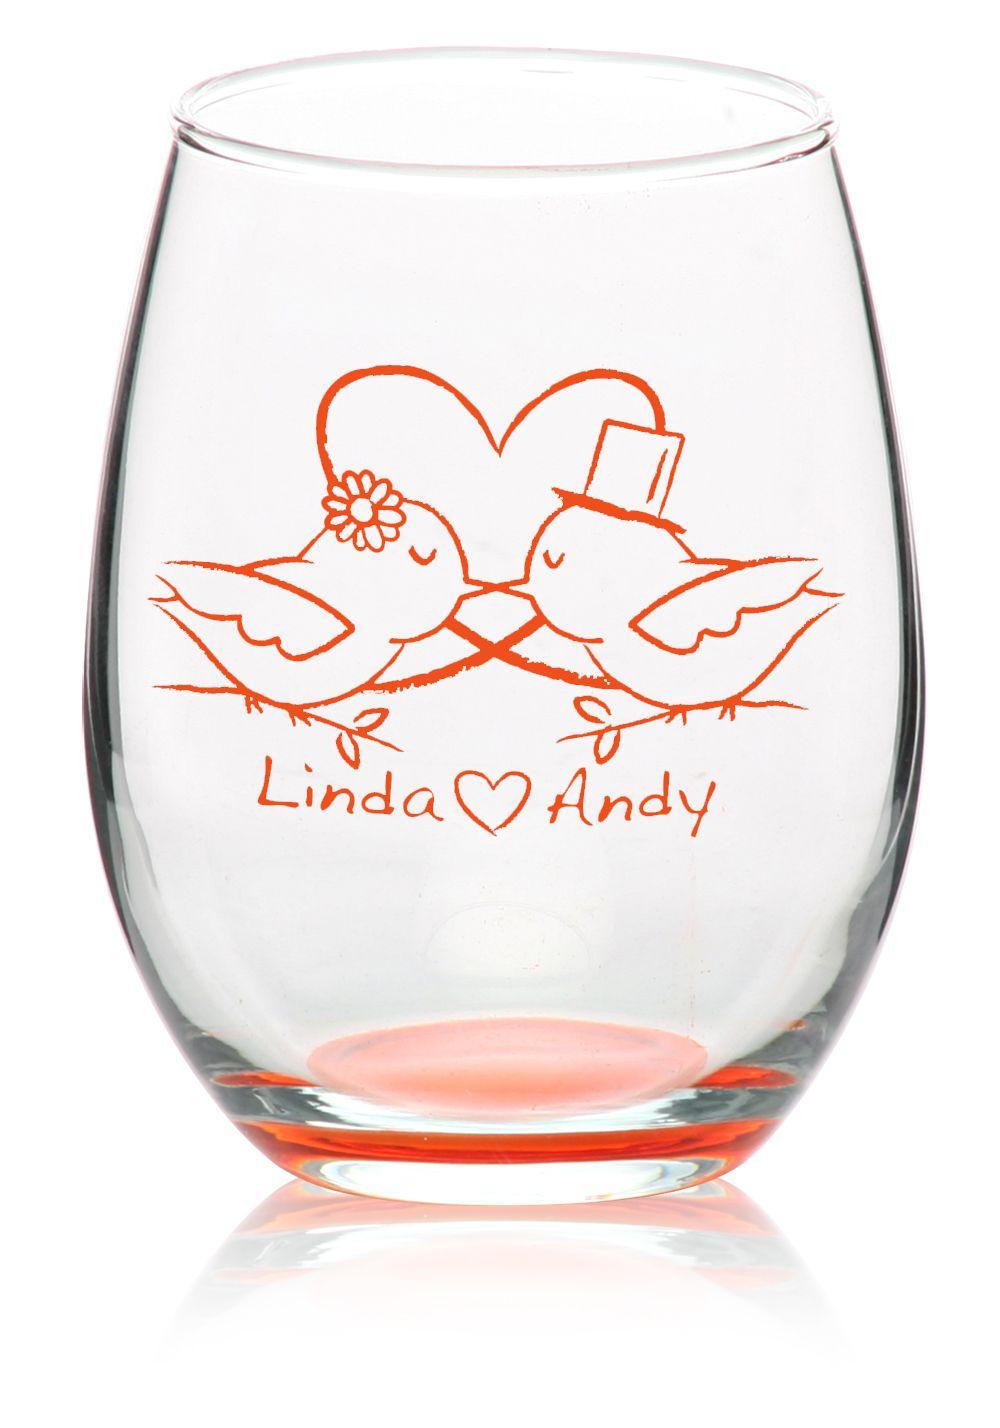 Custom Stemless Wine Glasses - Personalized Wine Glasses | Wine ...